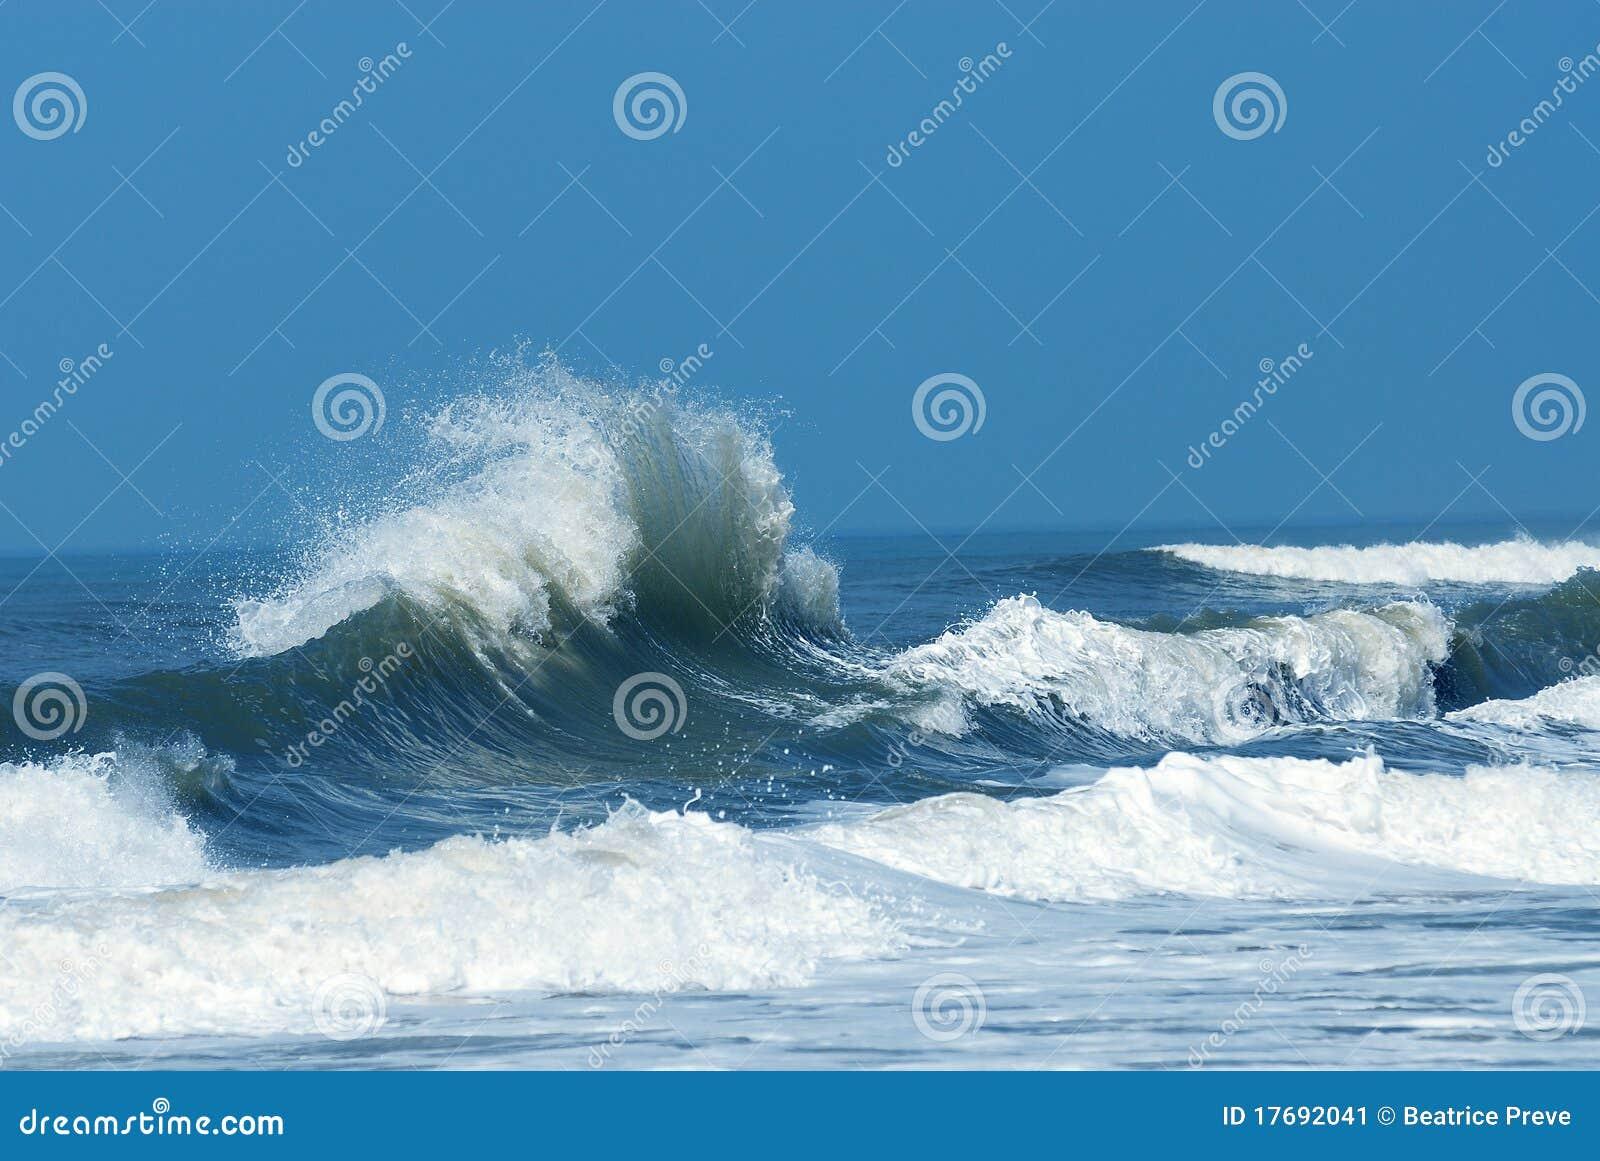 Powerful Crashing Wave